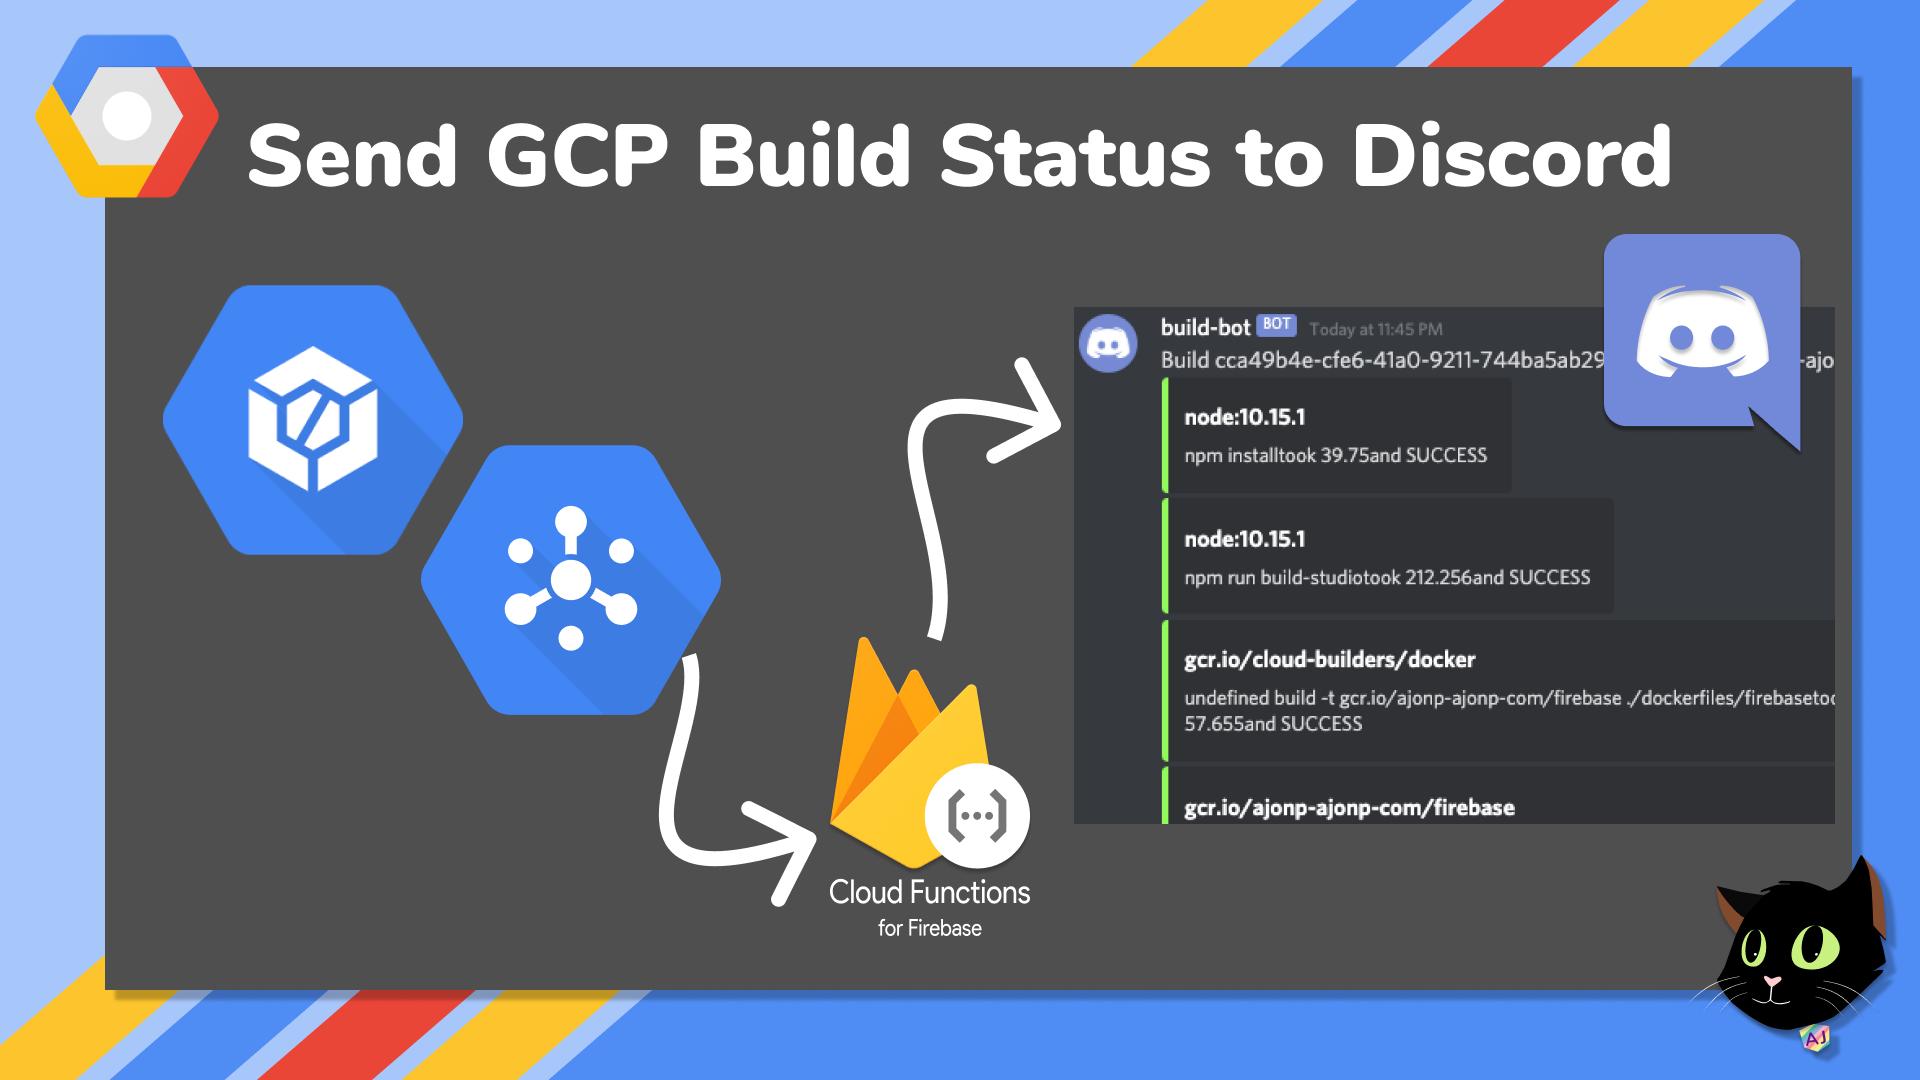 Send GCP Build Status to Discord